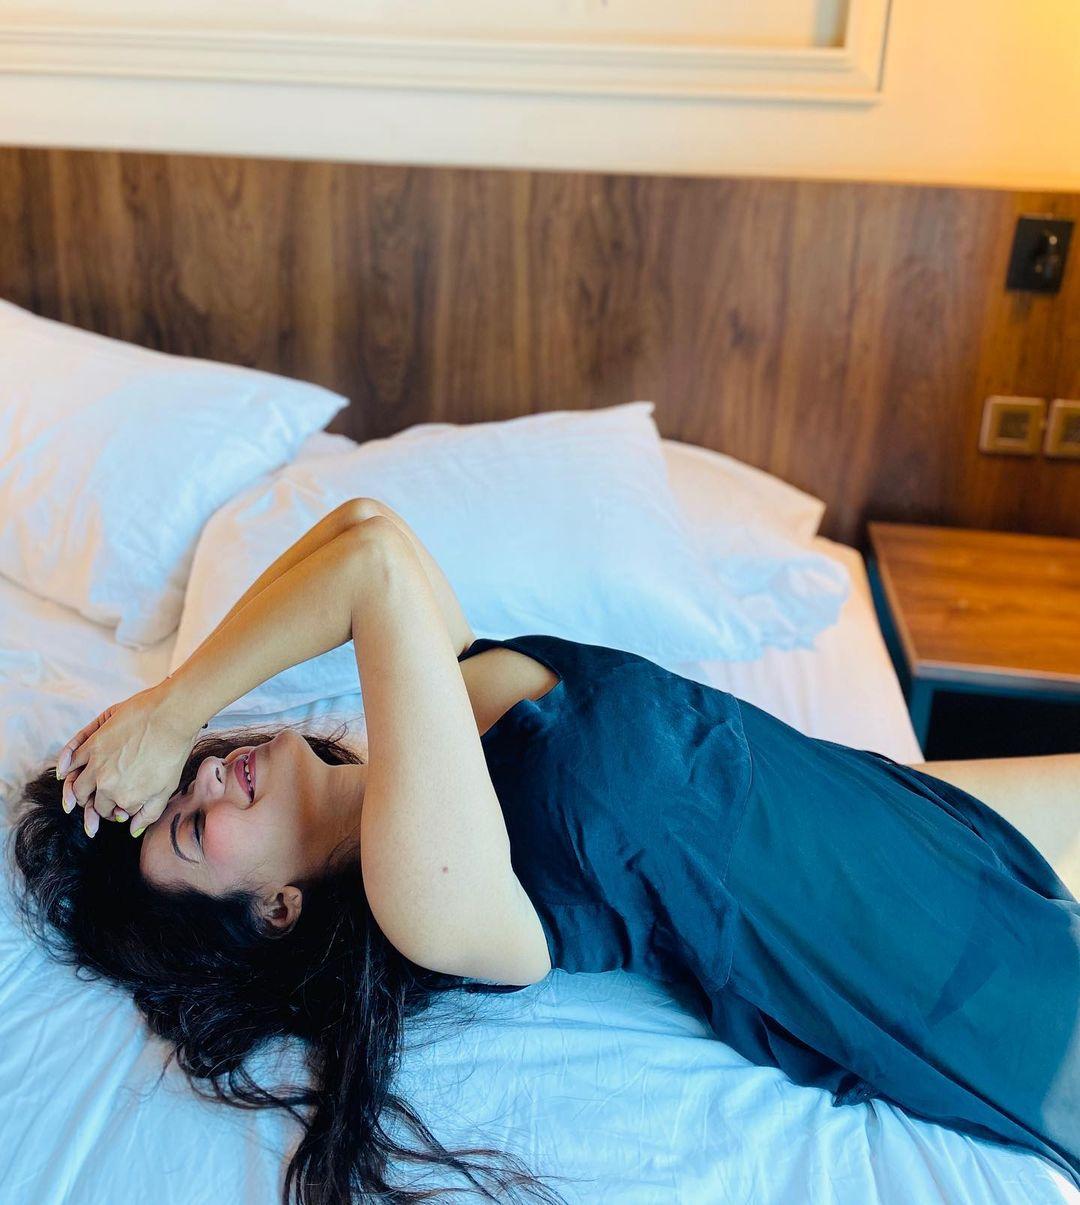 Monalisa Bedroom private Photos